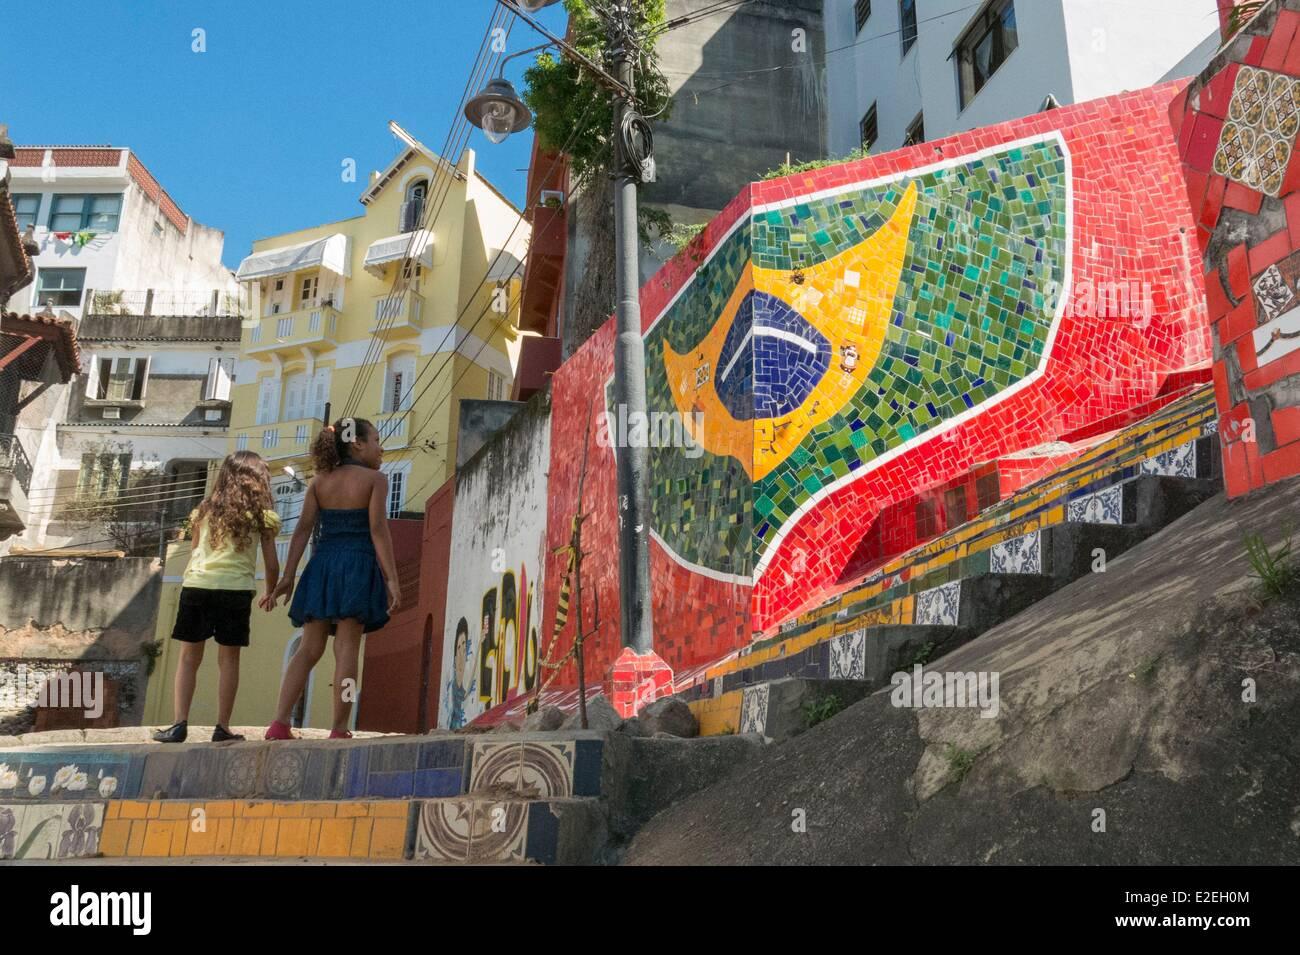 Brasilien Rio De Janeiro Stadtteil Santa Teresa Und Lapa Treppen